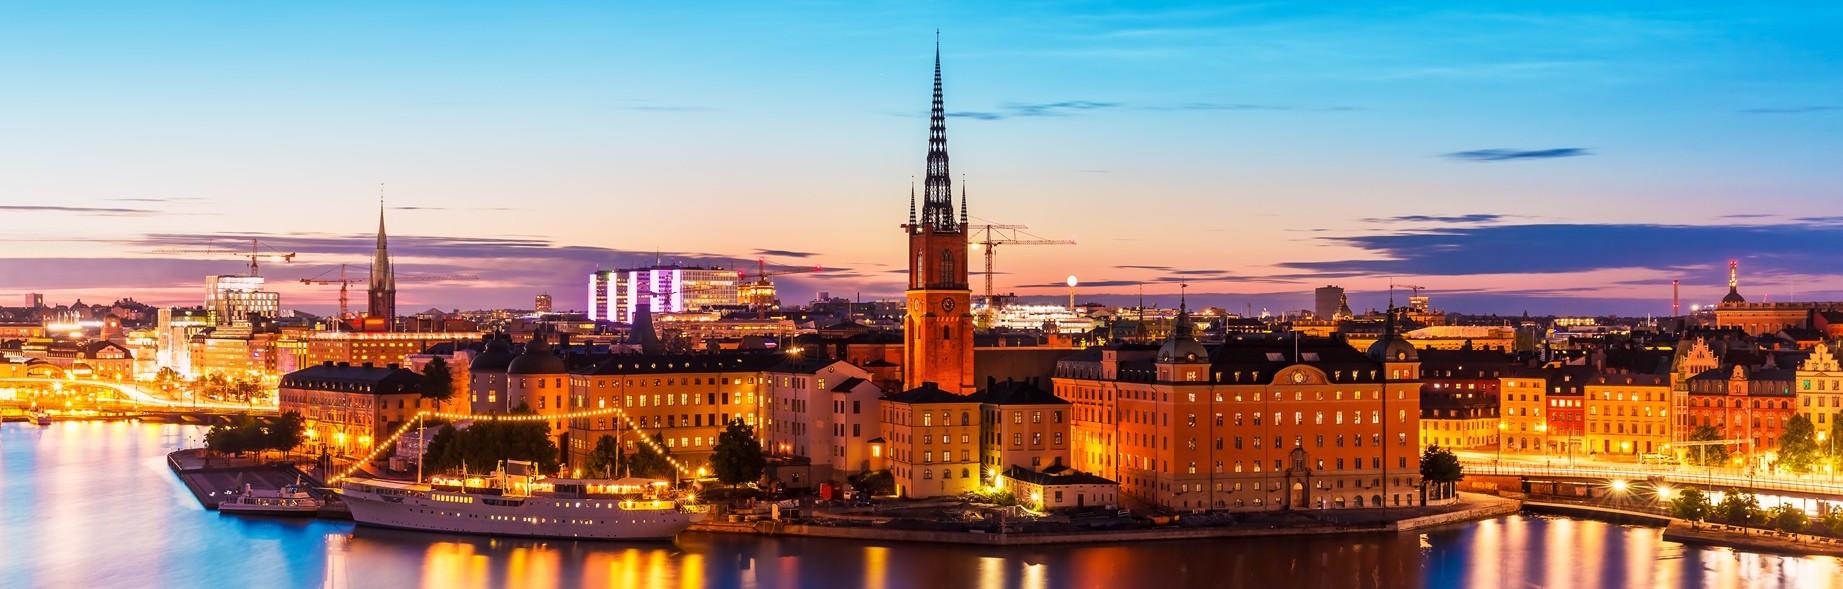 030_Stockholm